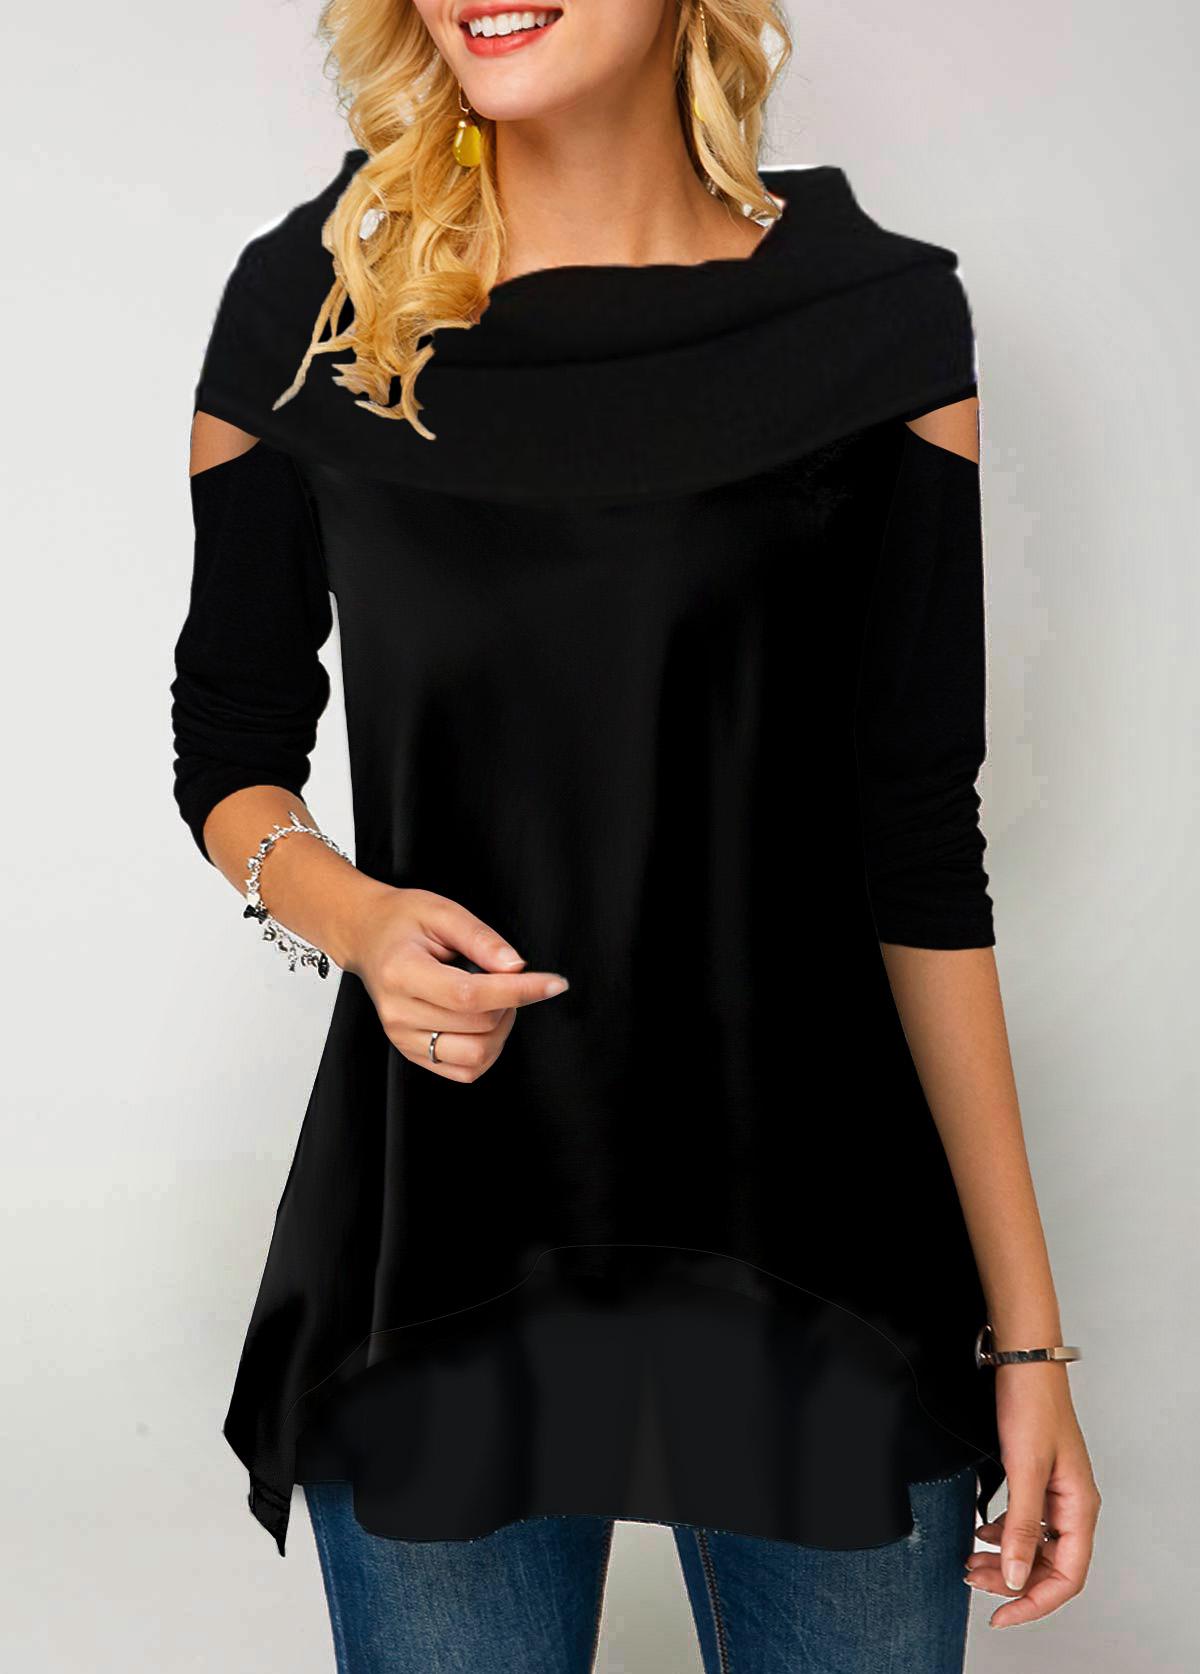 Long Sleeve Black Chiffon Patchwork T Shirt